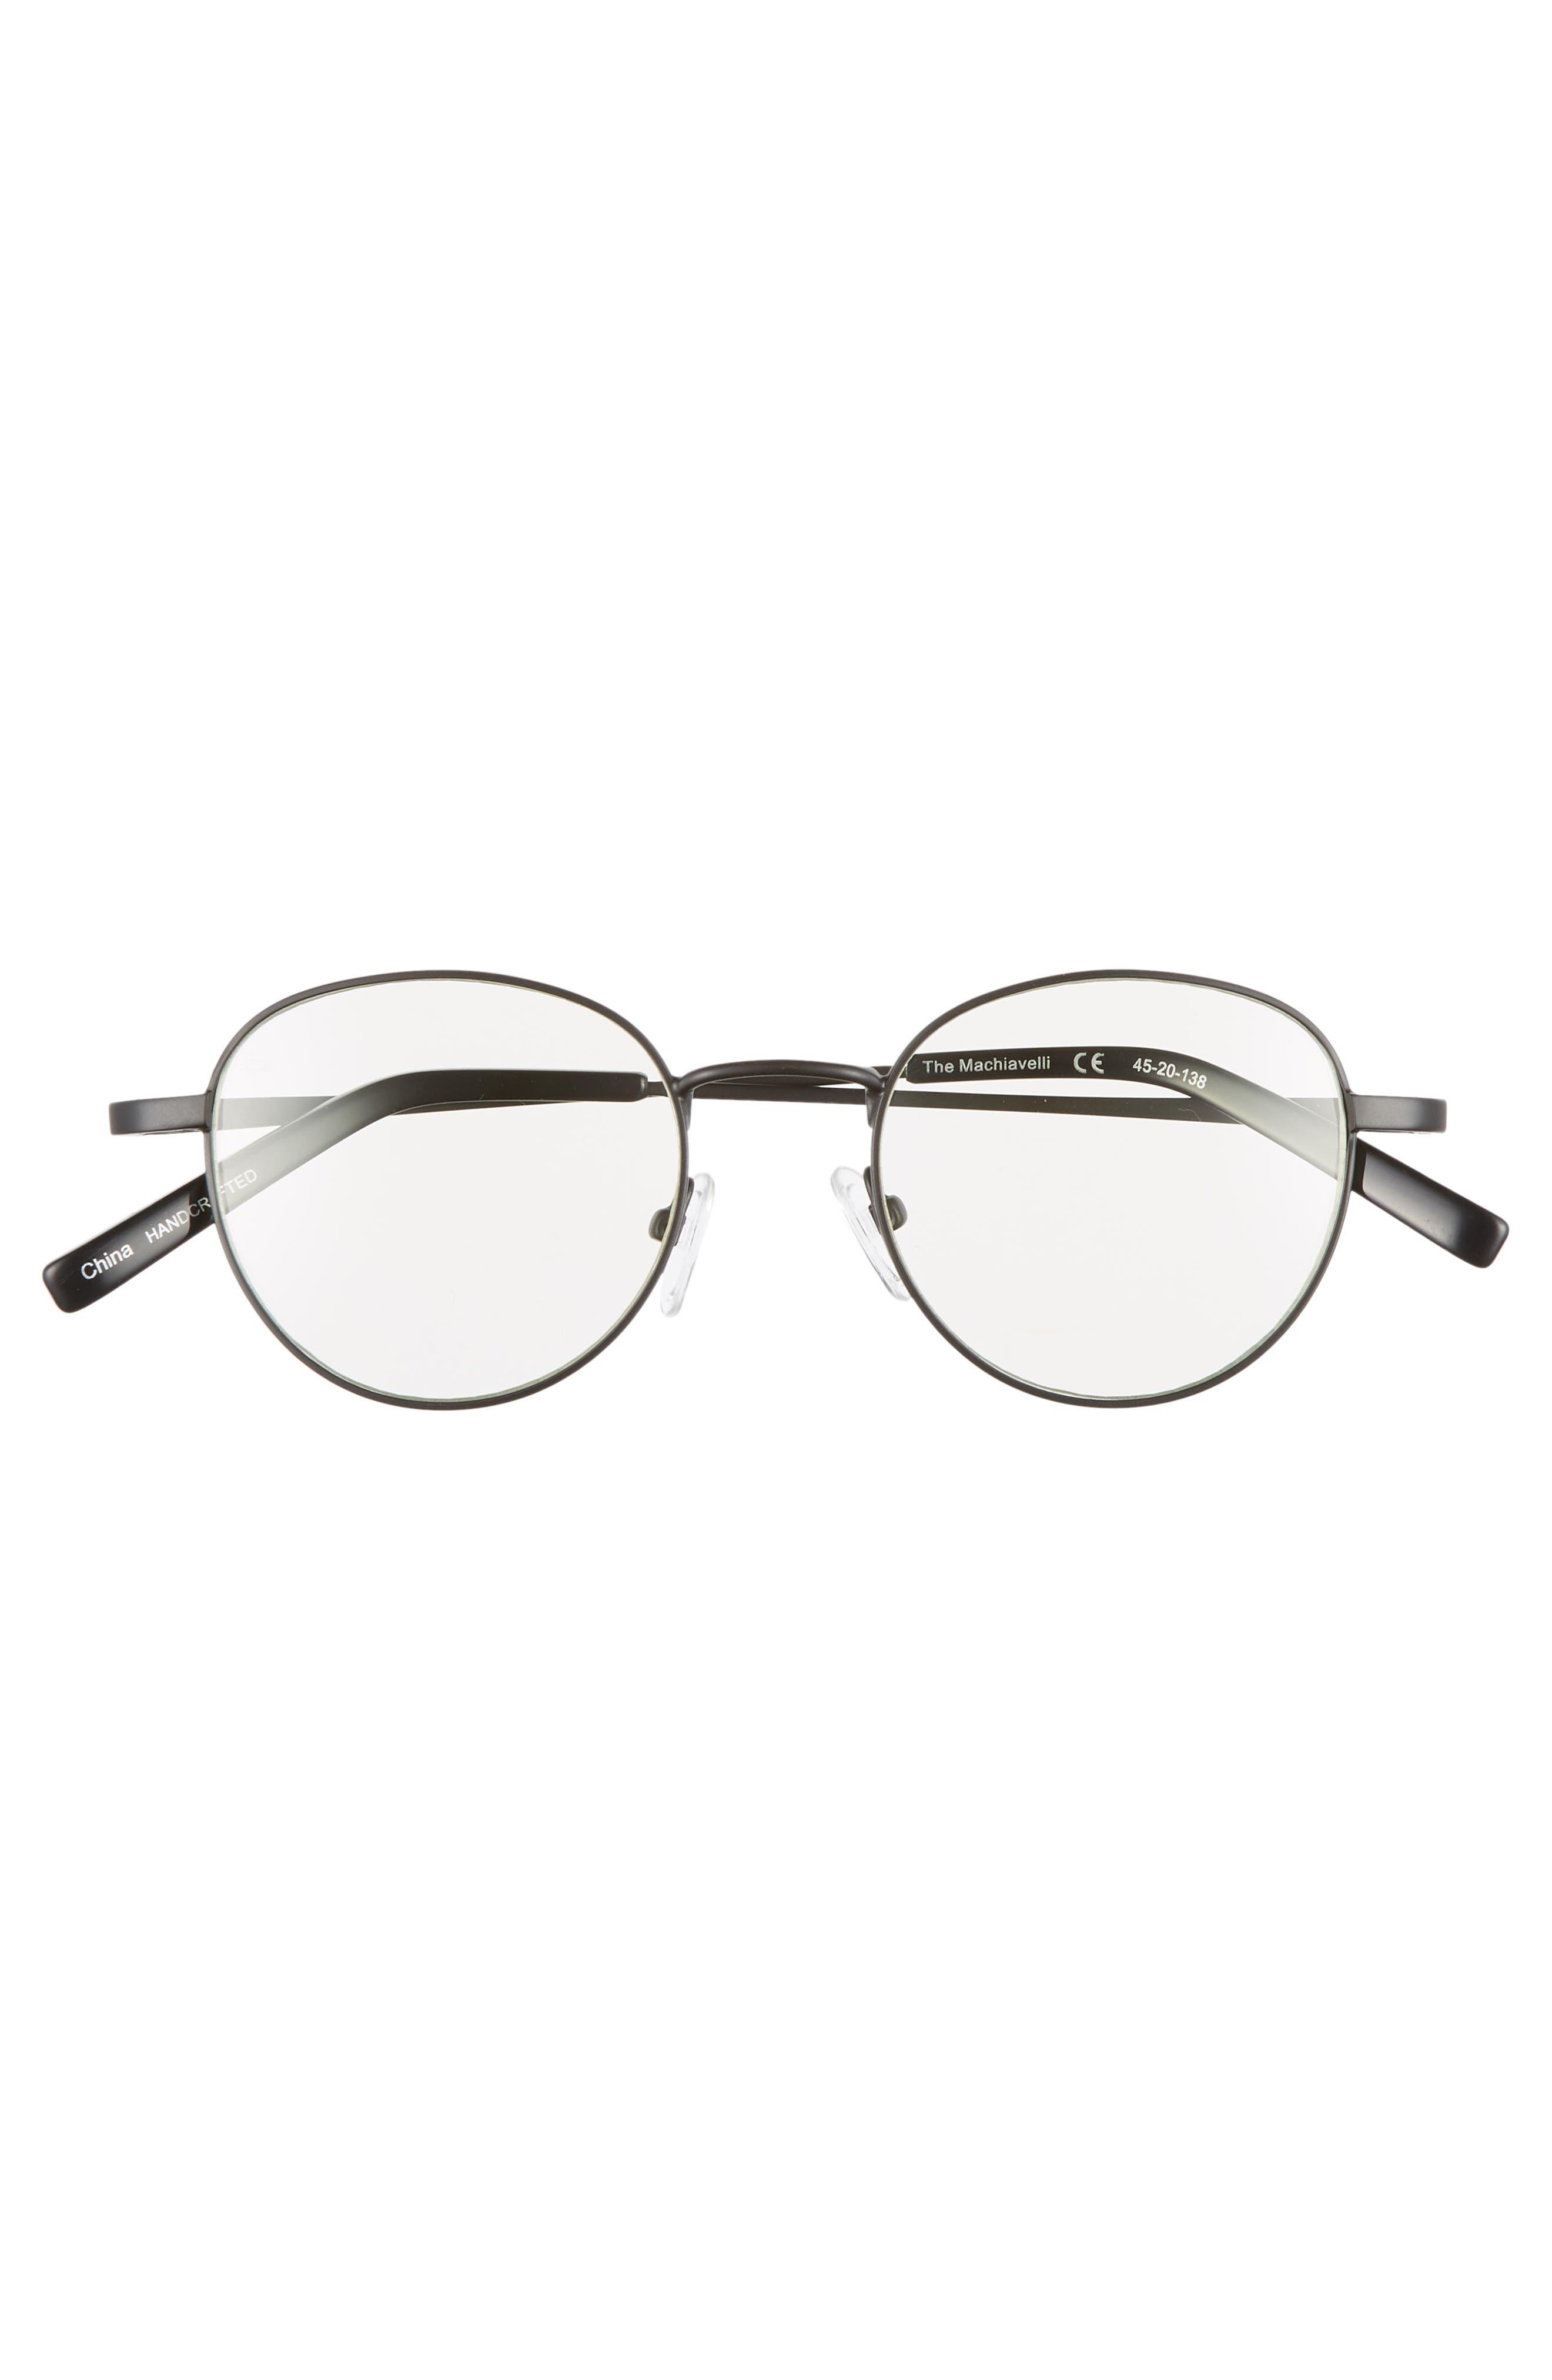 Privé Revaux The Machiavelli 45mm Blue Light Blocking Glasses,                             Alternate thumbnail 5, color,